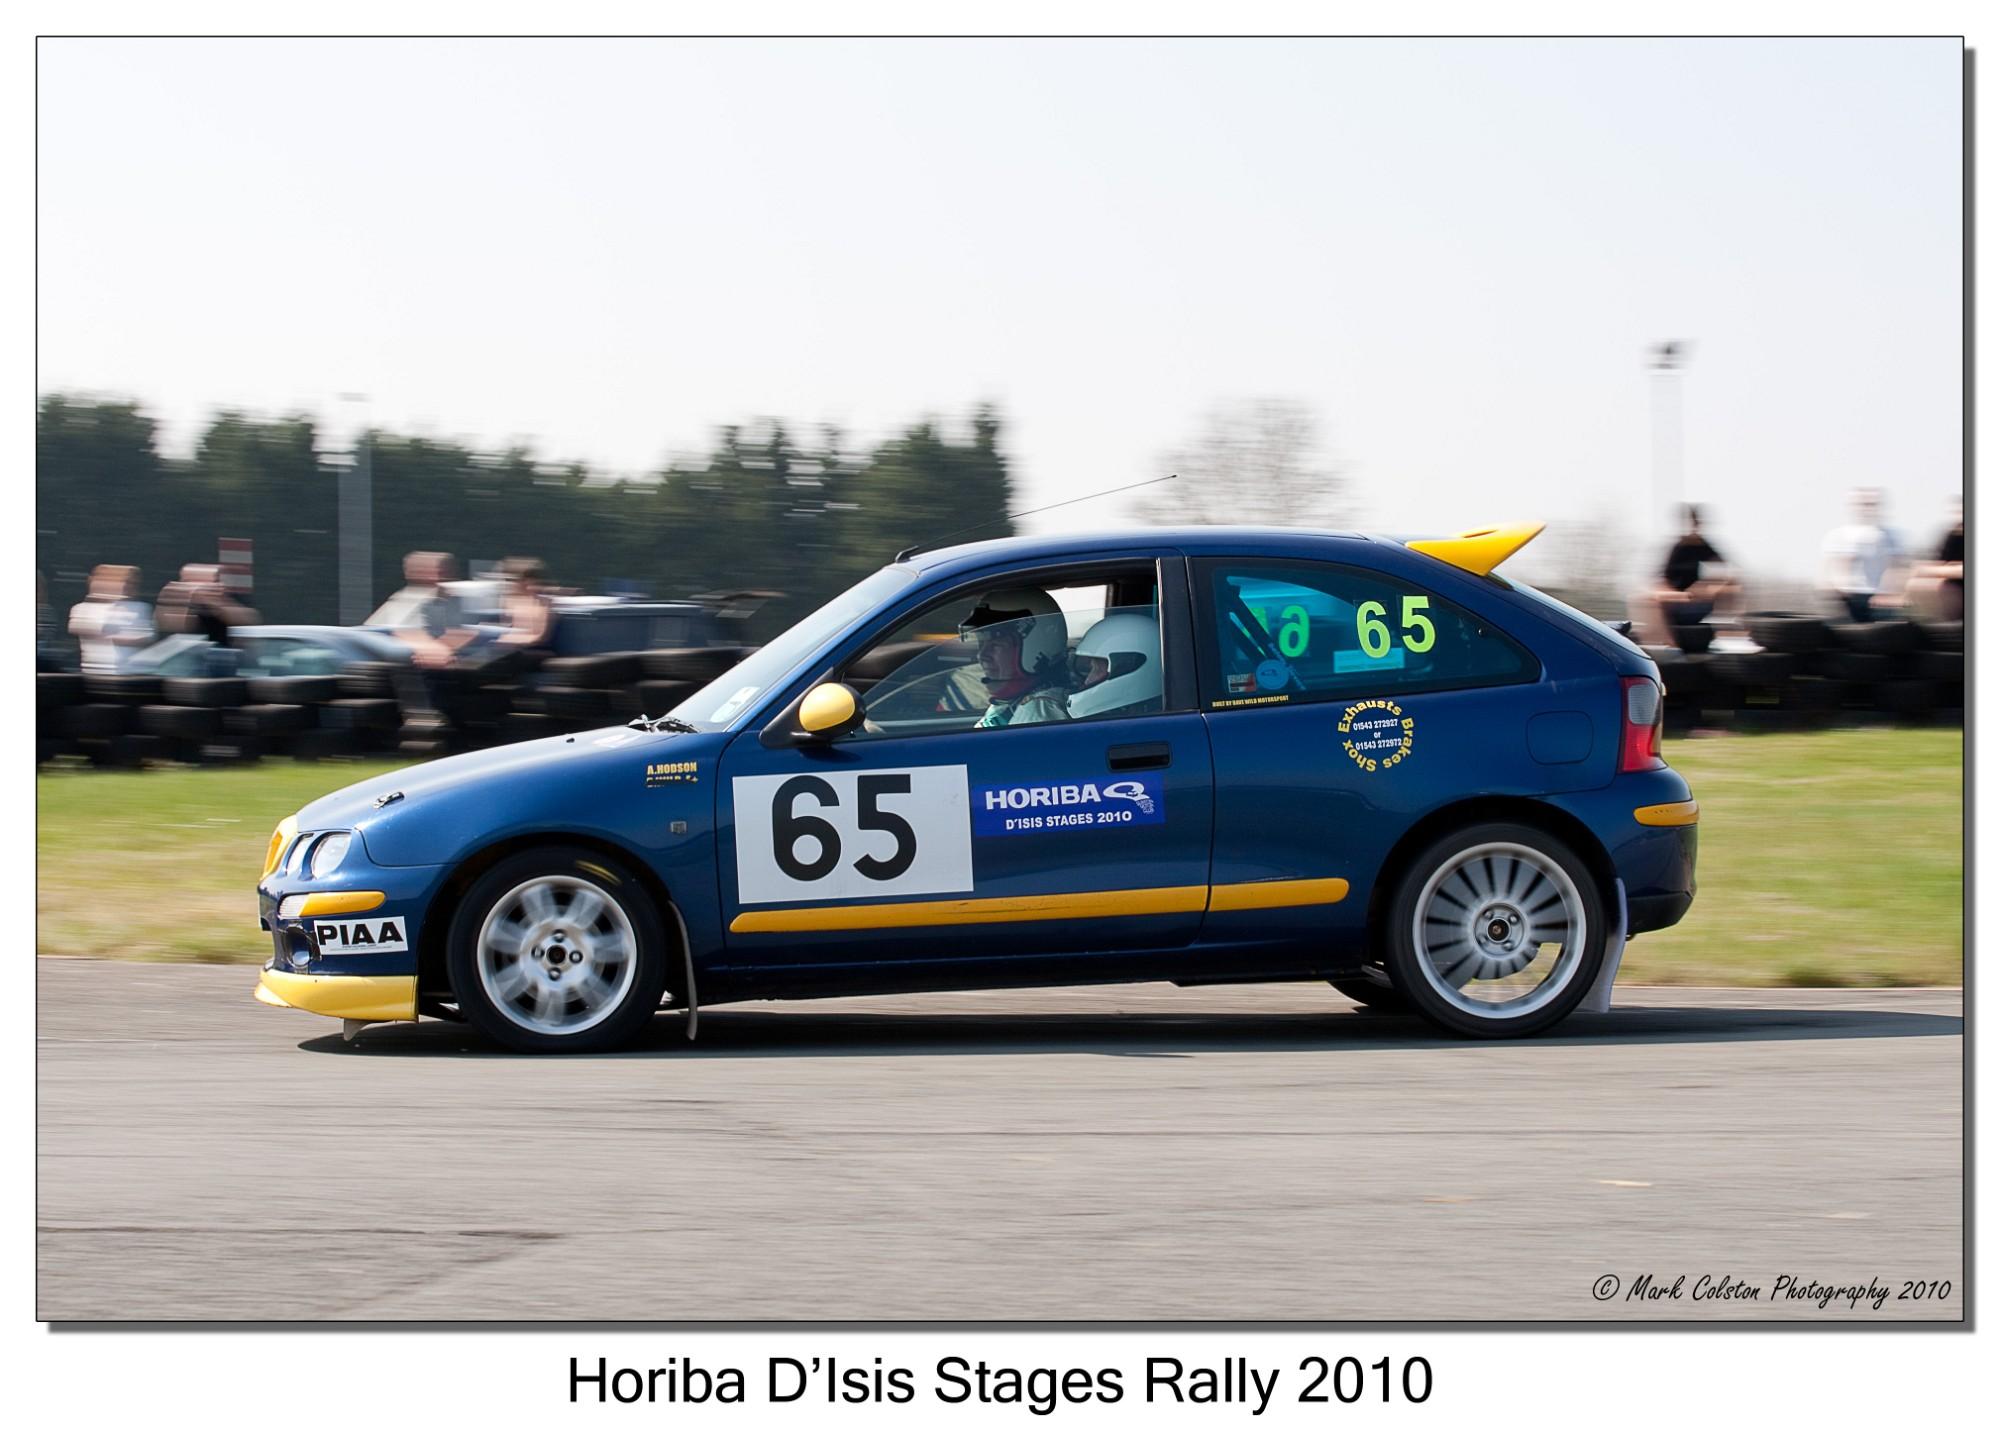 IMAGE: http://www.mark.colston-online.co.uk/Motorsport/D'Isis%202010/slides/IMG_2371%20EOS-1D%20Mark%20III%20copy.jpg